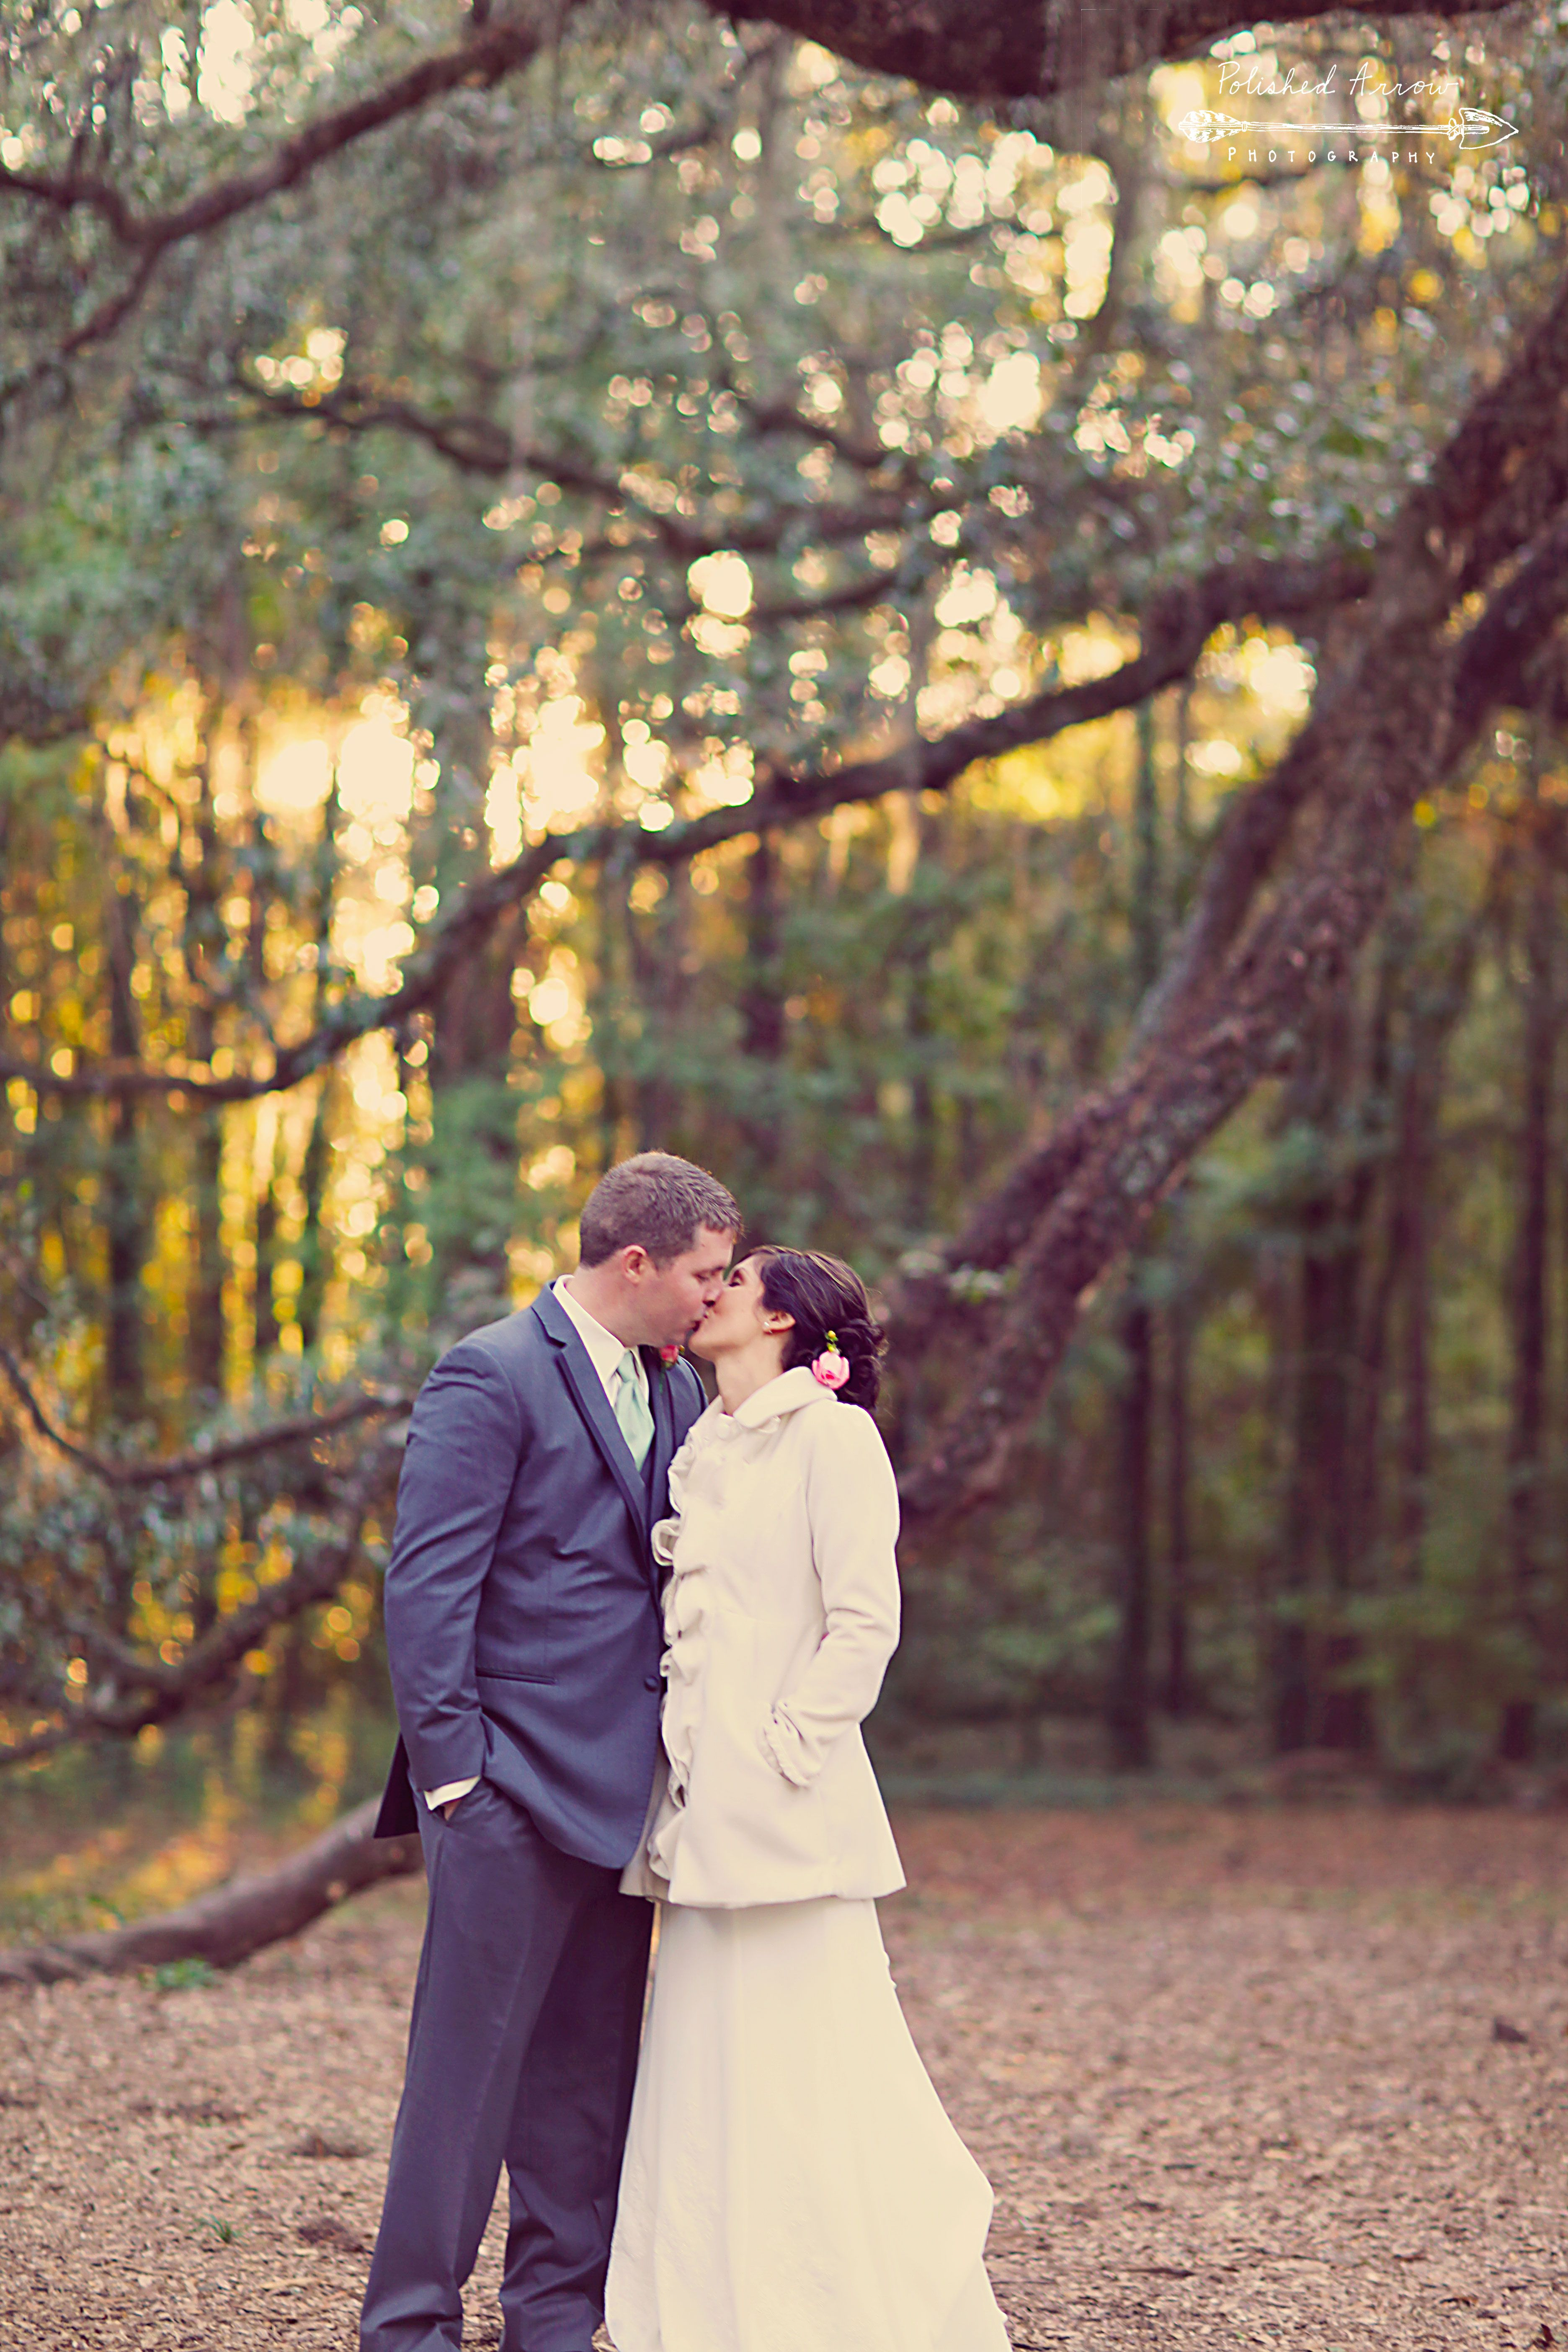 Tallahassee Wedding Photography At Lichgate